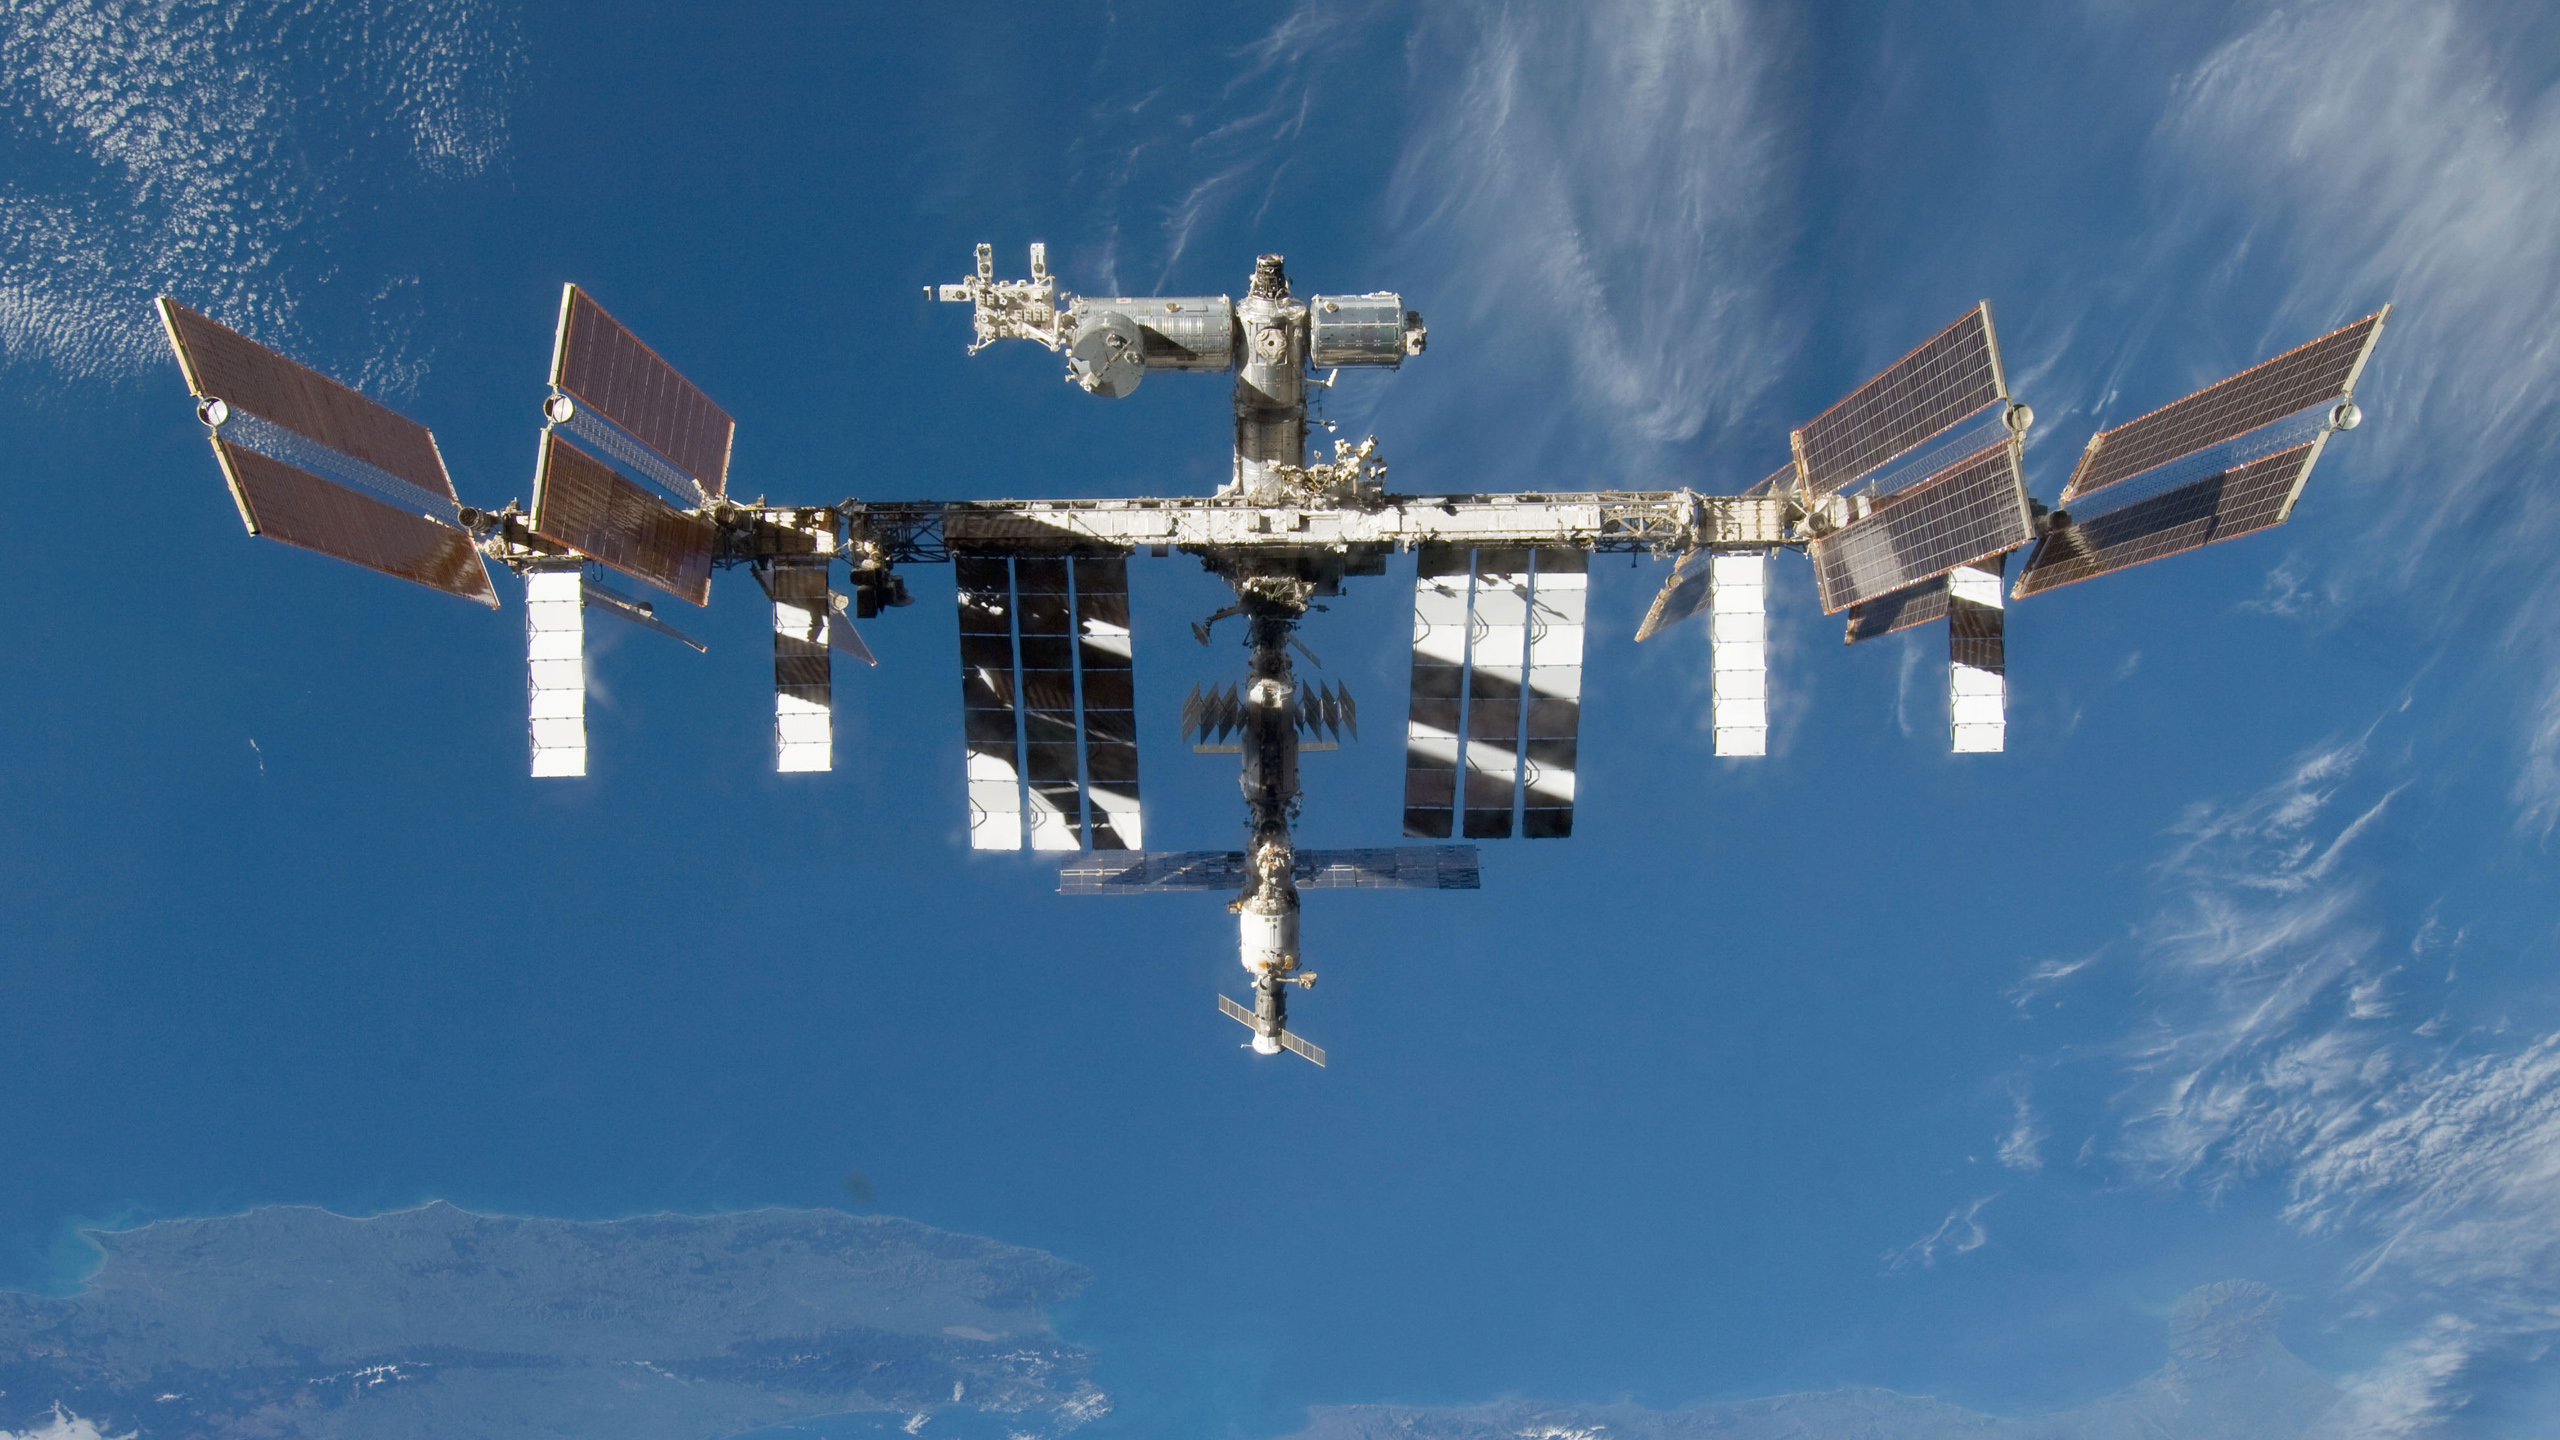 International space station hd wallpaper background - Space station wallpaper ...